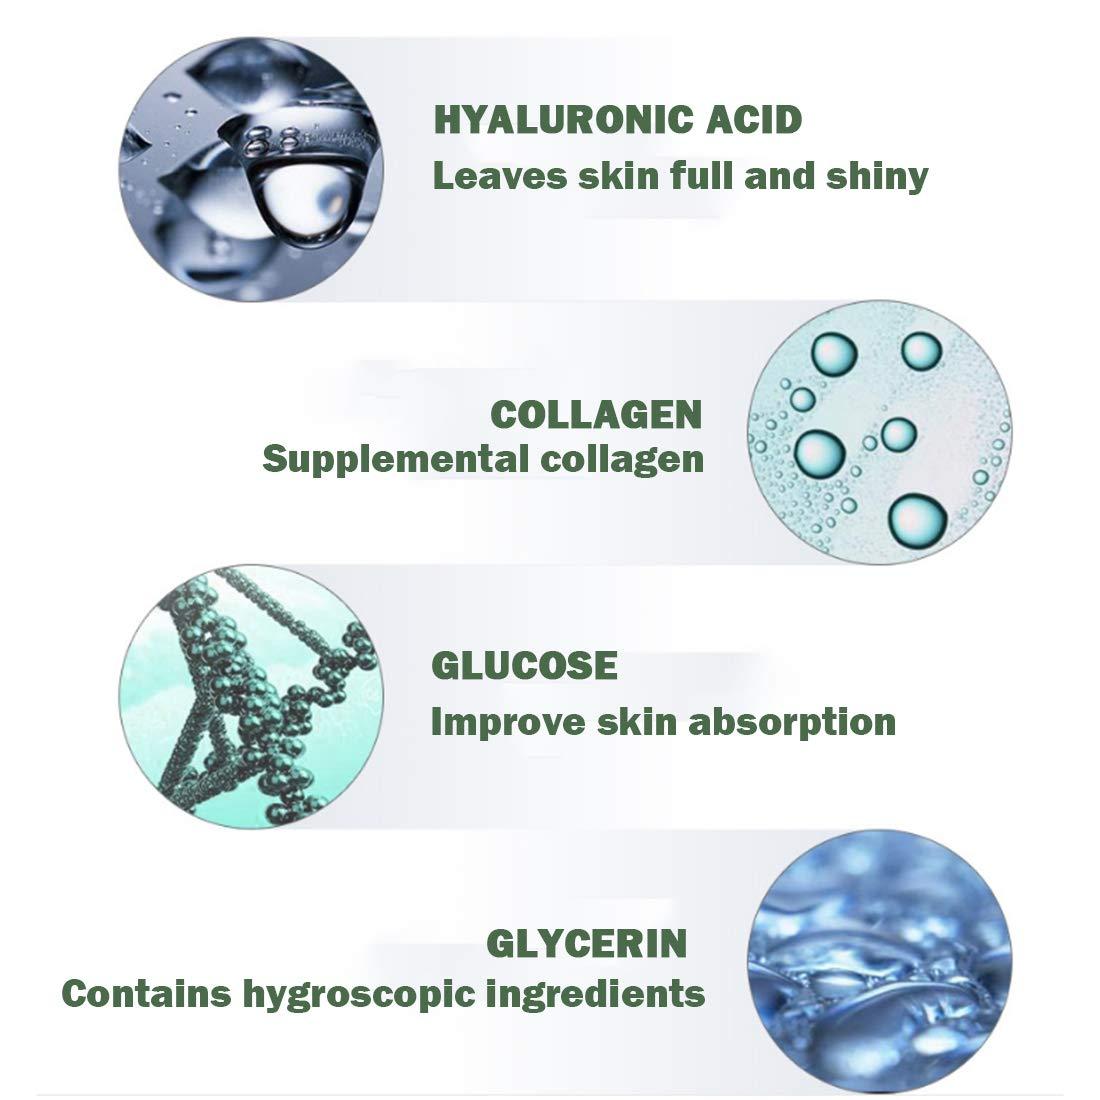 Loweryeah Snail Repair Anti-aging Cream 25g Collagen Moisturizing Nourish Repair Damaged Face Care Hyaluronic Acid Cream by Loweryeah (Image #5)